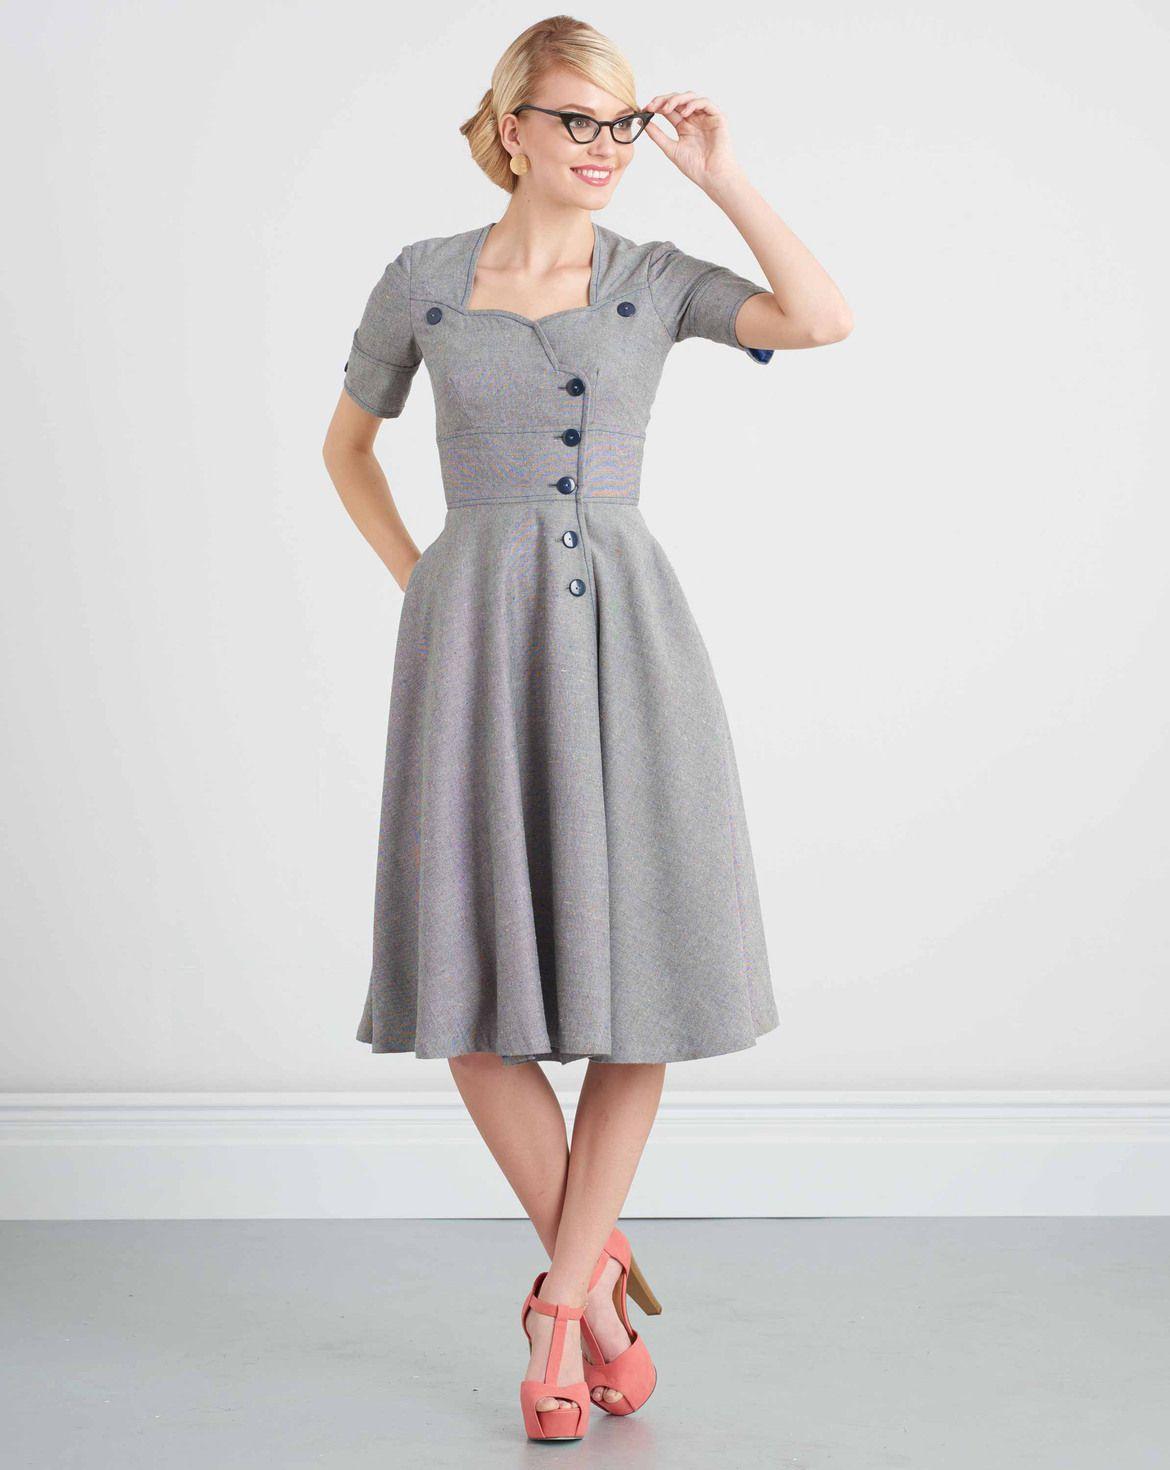 burda style, Simplicity Schnitt, Kleid H/W 2017 #7951.K5 ...